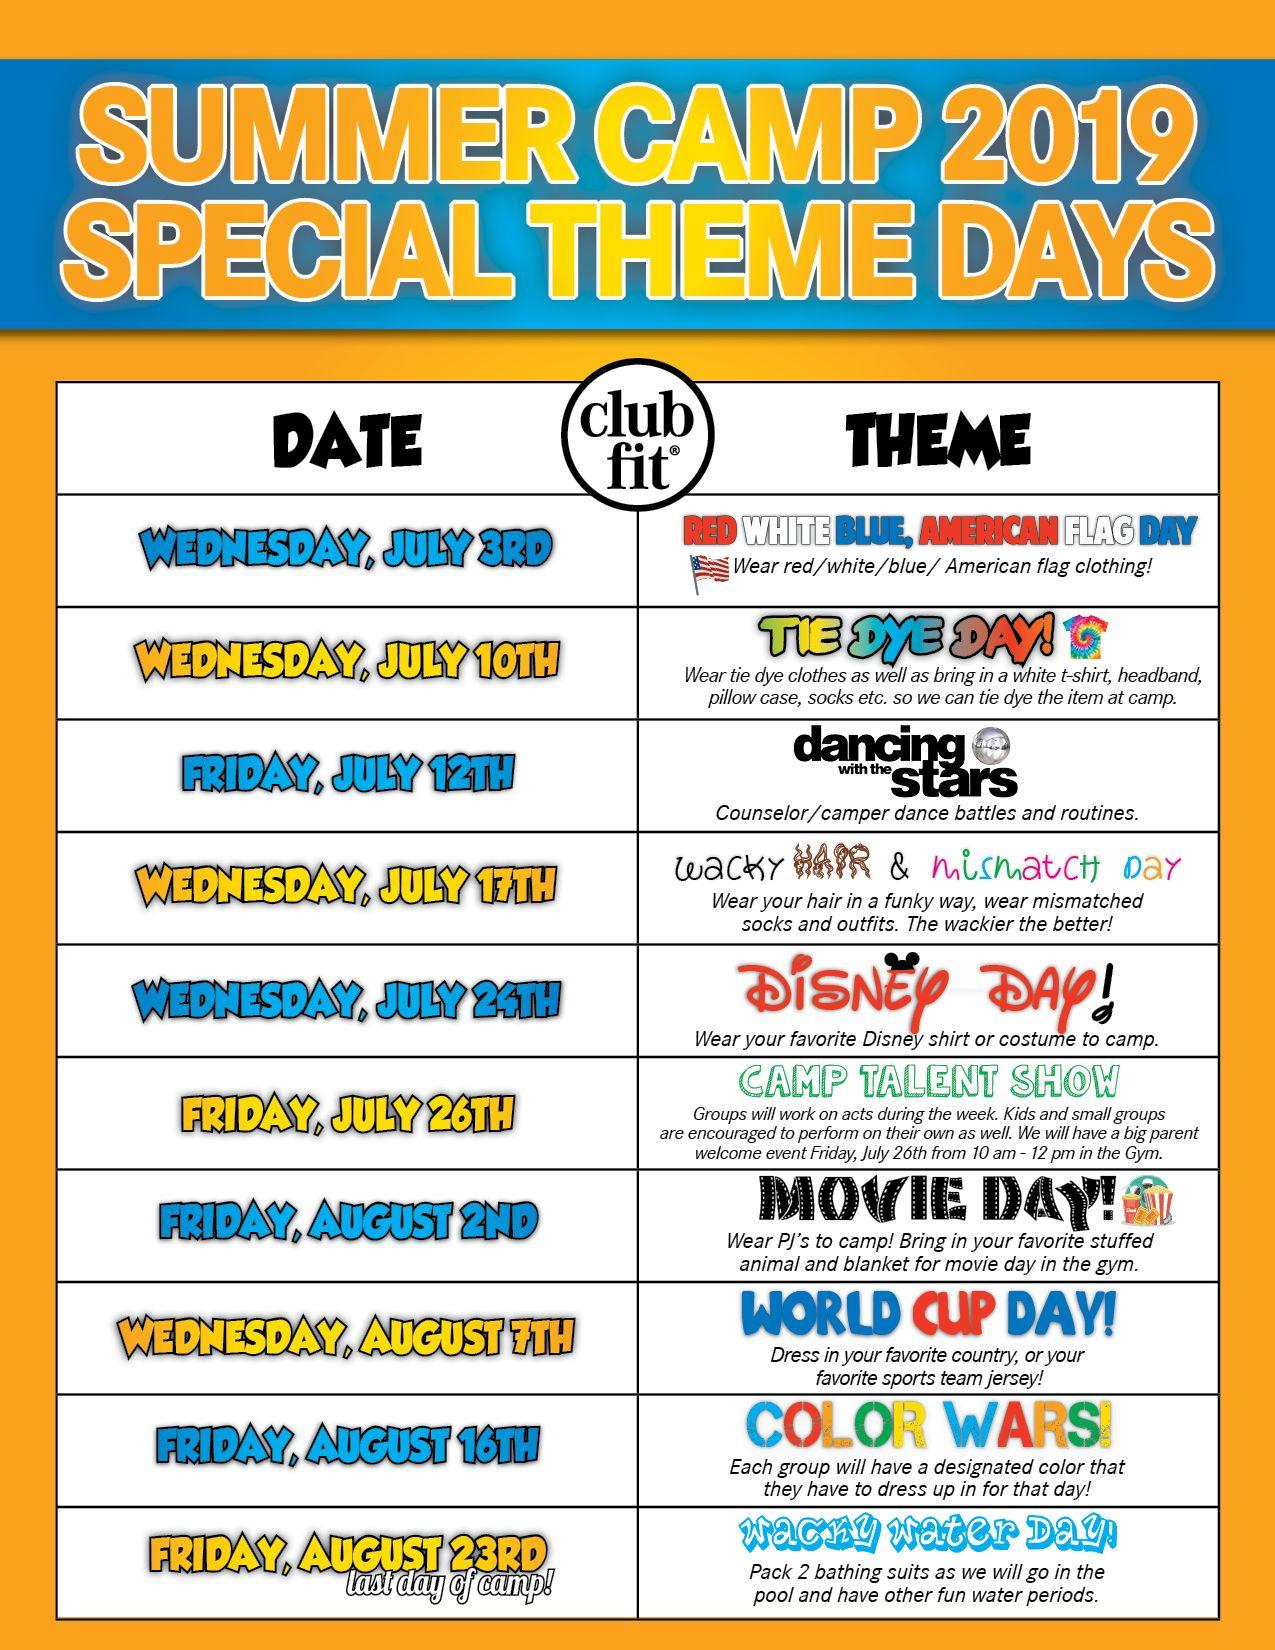 Camp Theme Days Lunch Menu Club Fit Briarcliff Theme Days